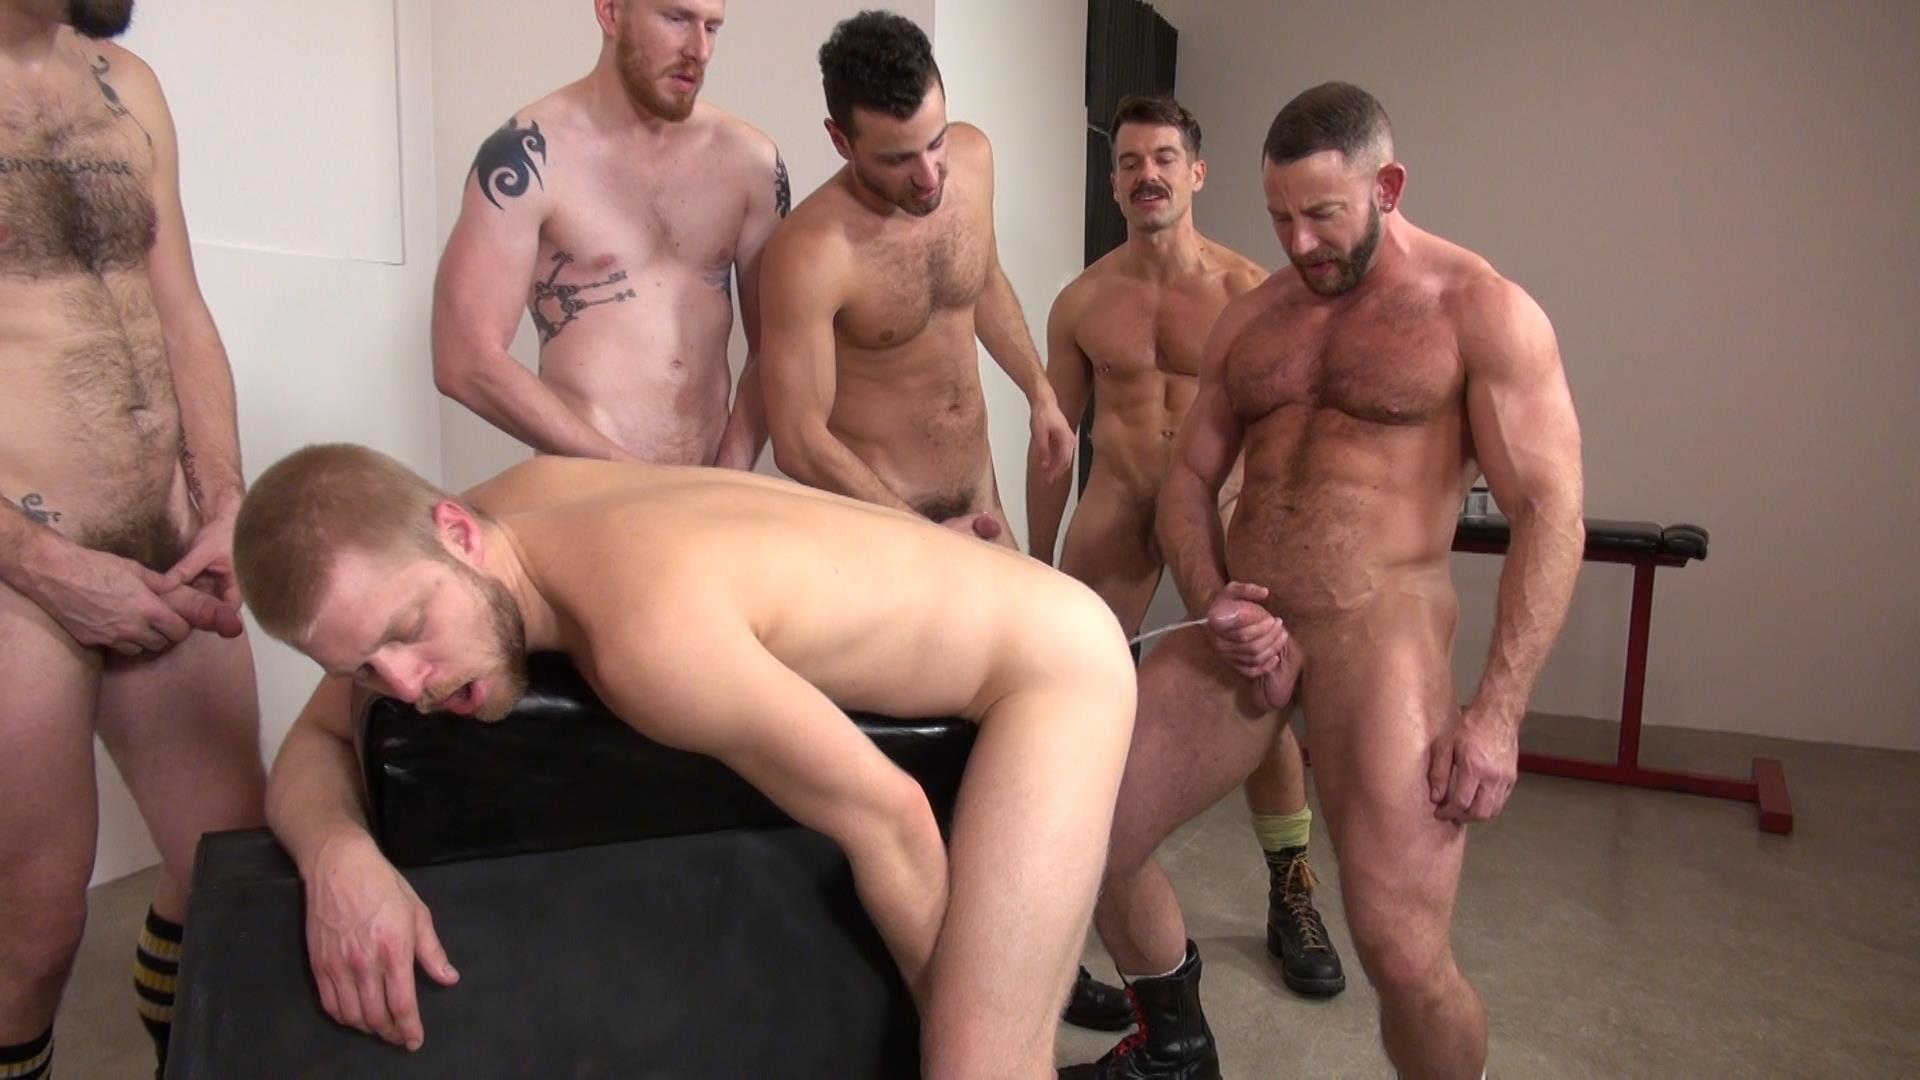 Bear Orgy Porno get along gay video raw orgy - porn images.